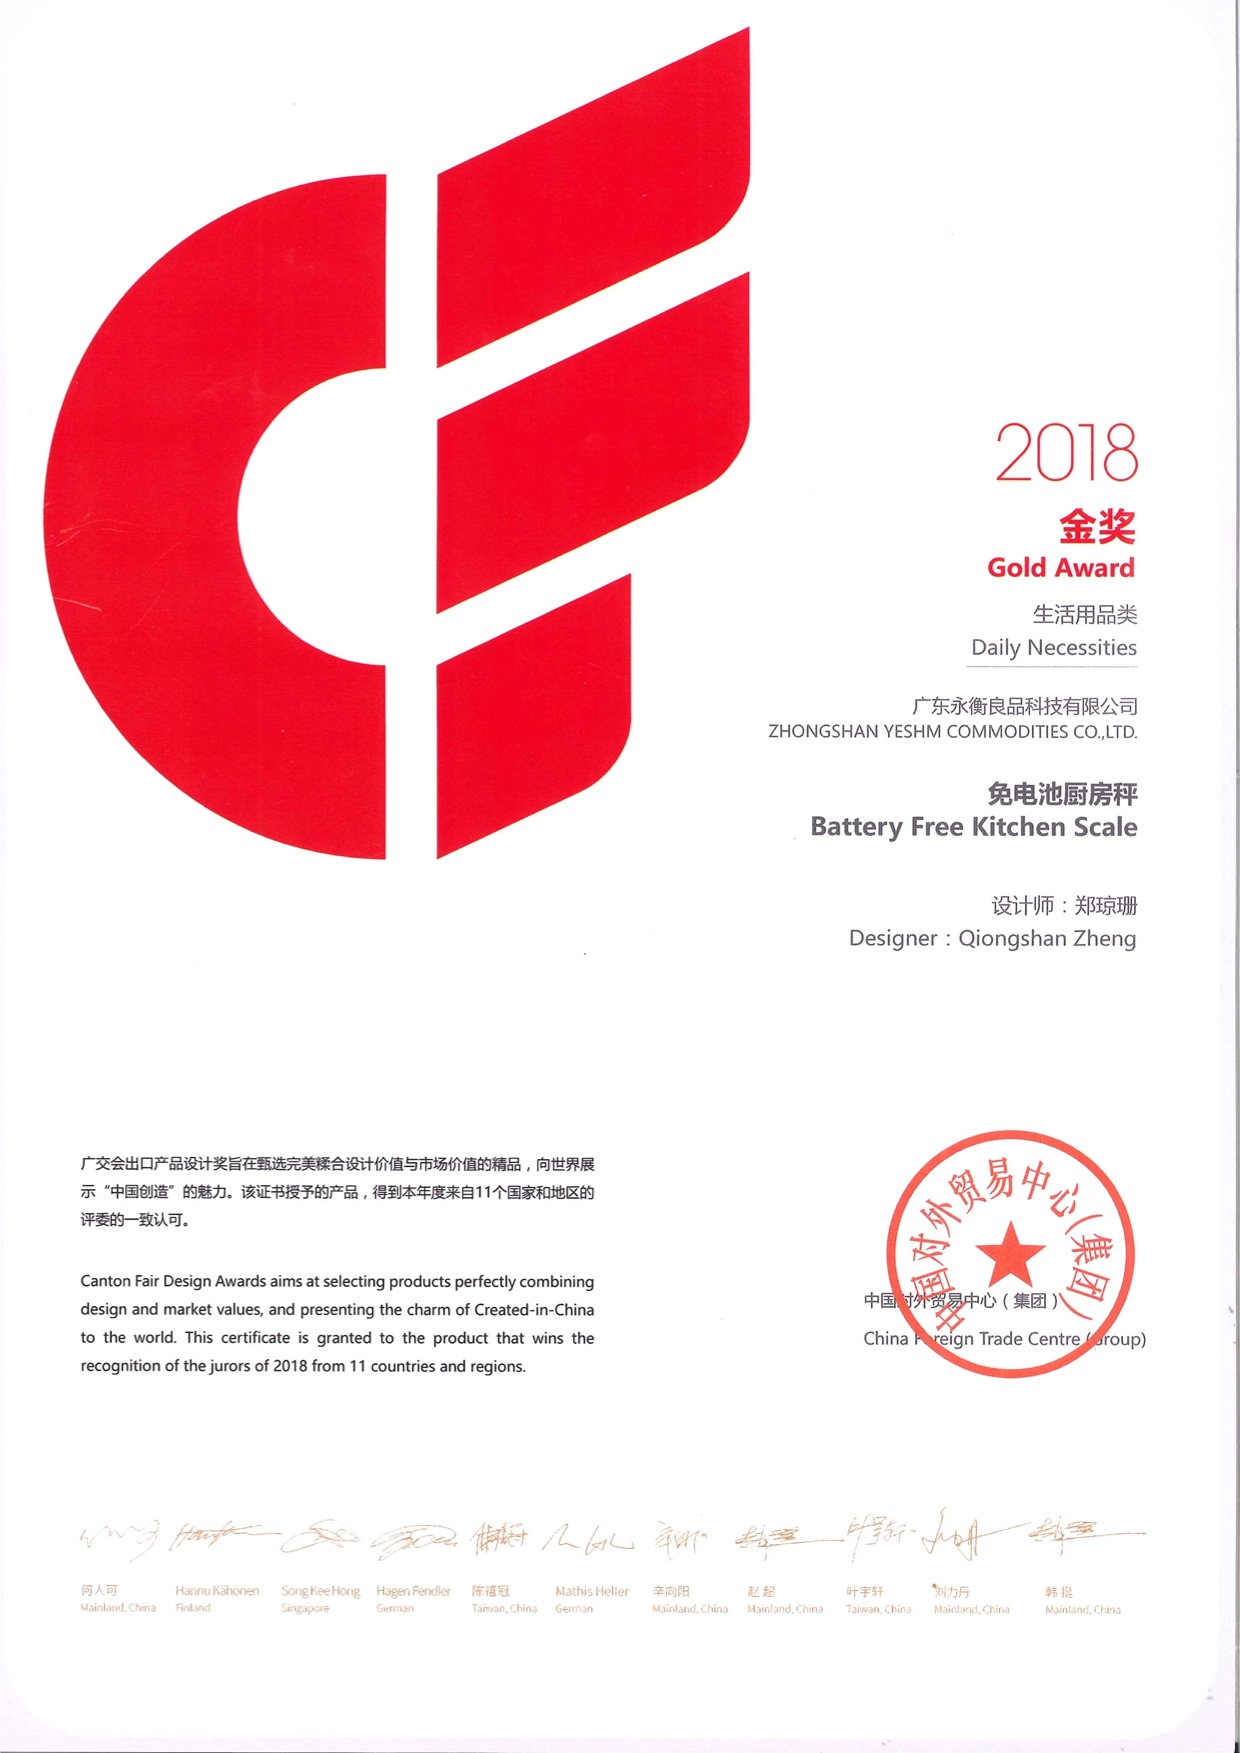 CF设计金奖 (2018年)